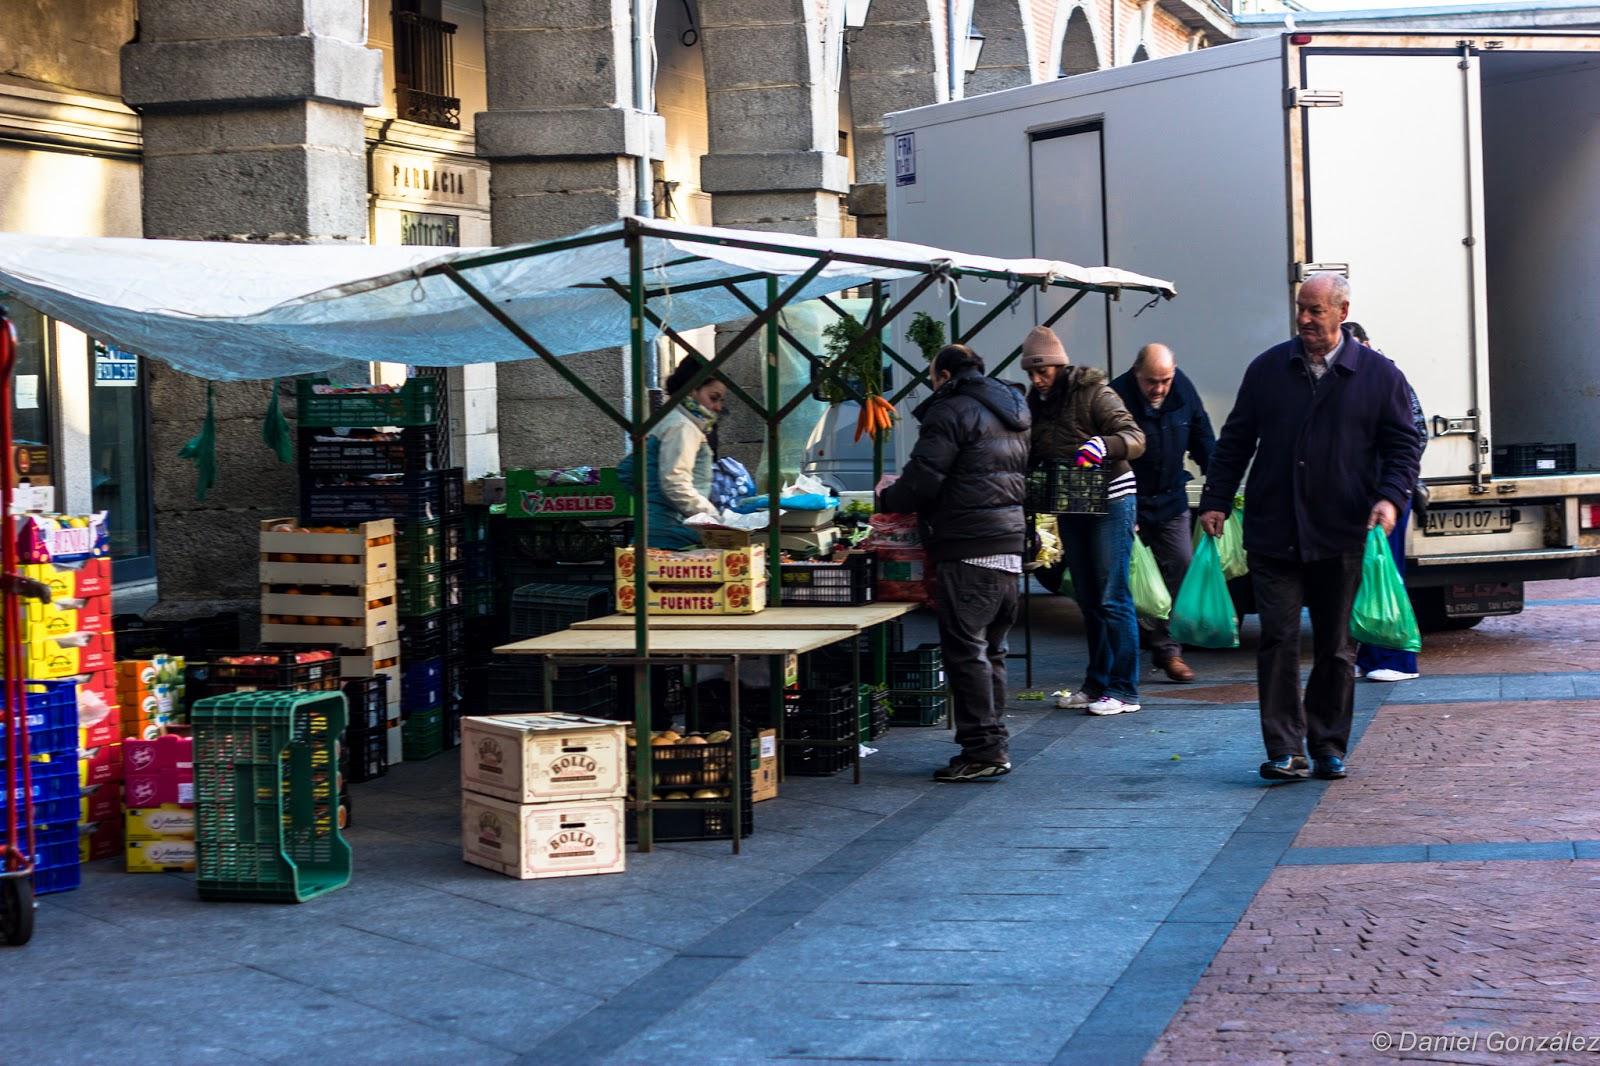 Hombre comprando, Mercado Chico, Avila 2014